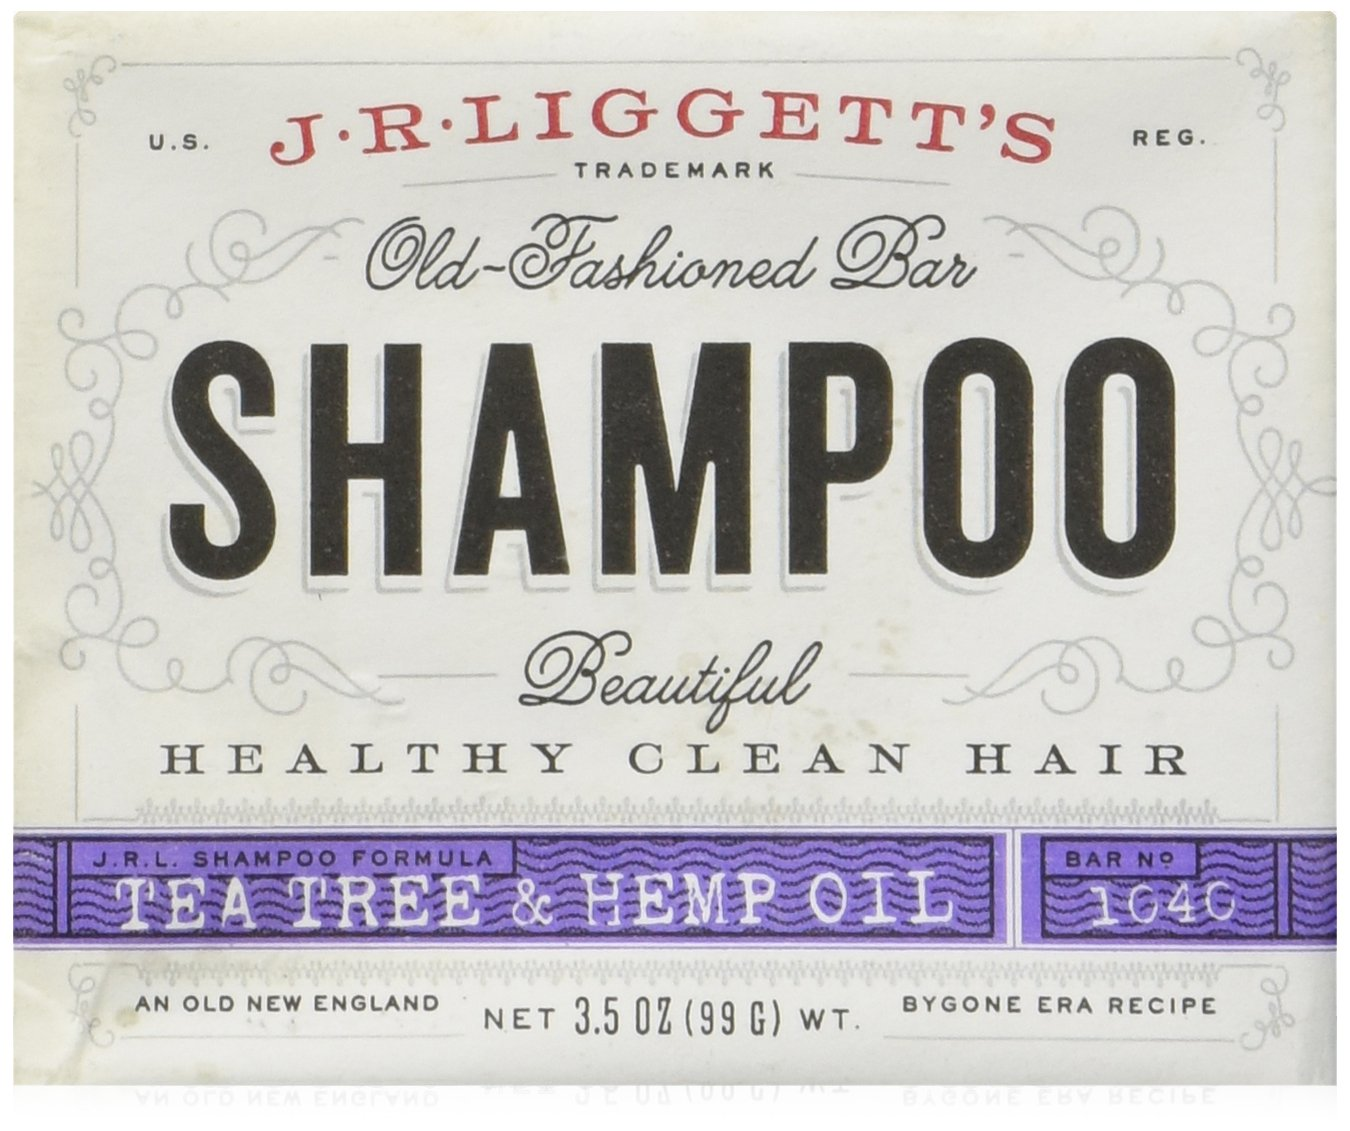 Shampoo Tea Tree & Hemp Oil Formula J.R. Liggett 3.5 Oz Bar Soap by J.R. Liggett